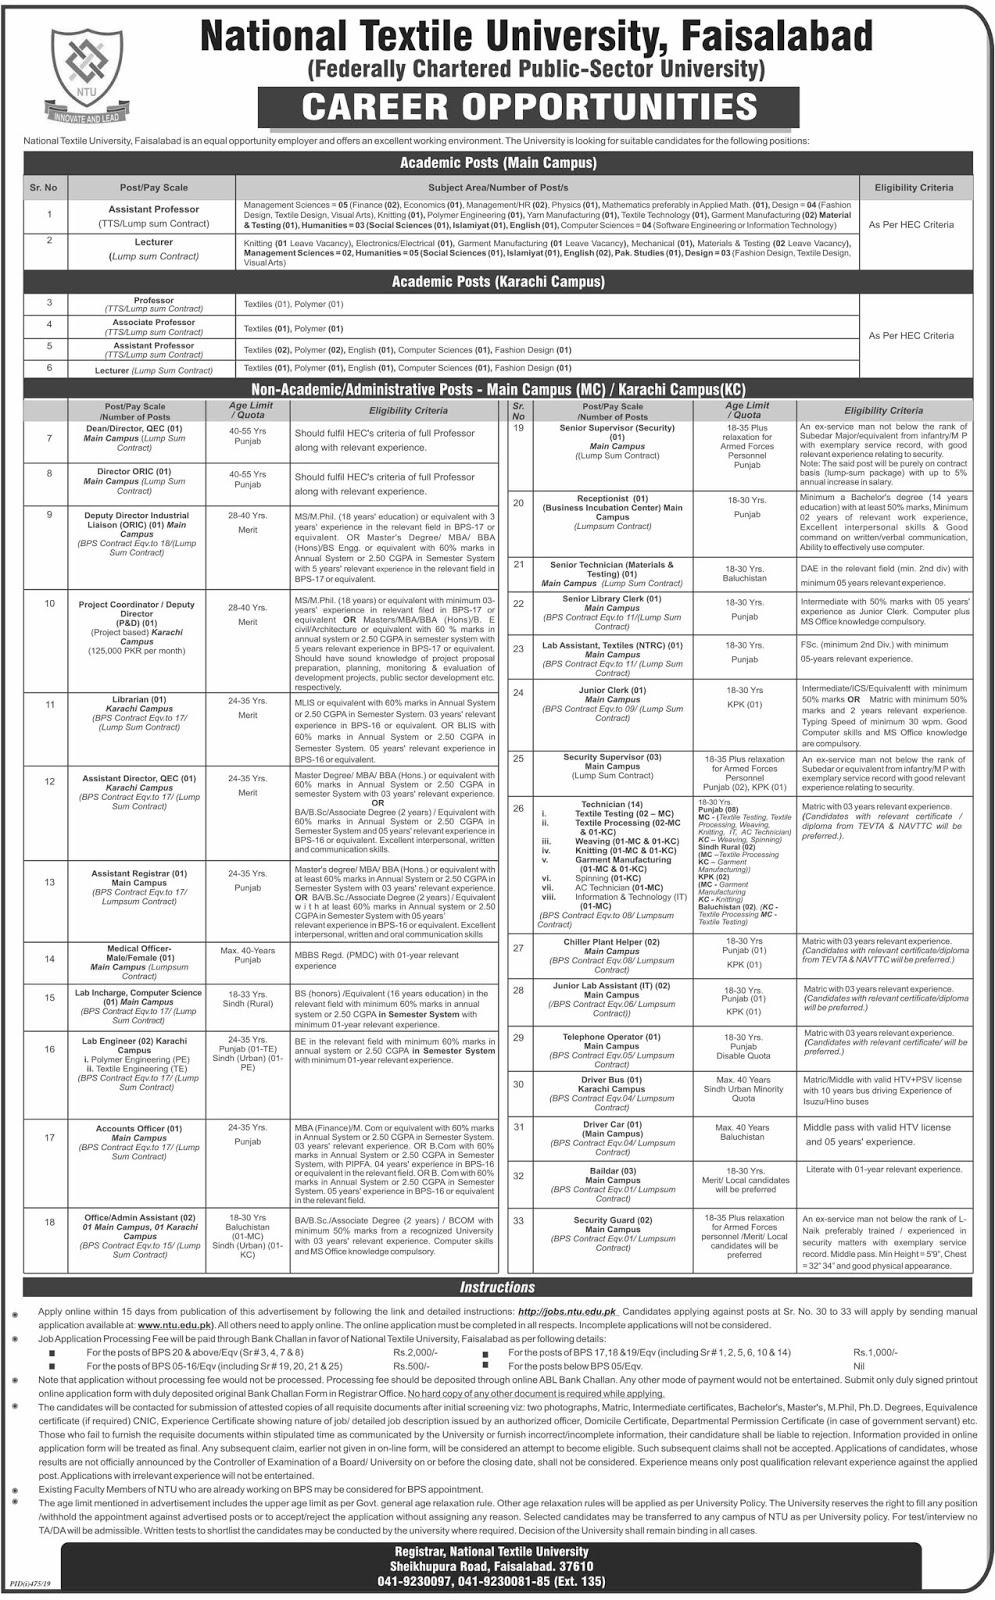 National Textile University Faisalabad Jobs 2019 July